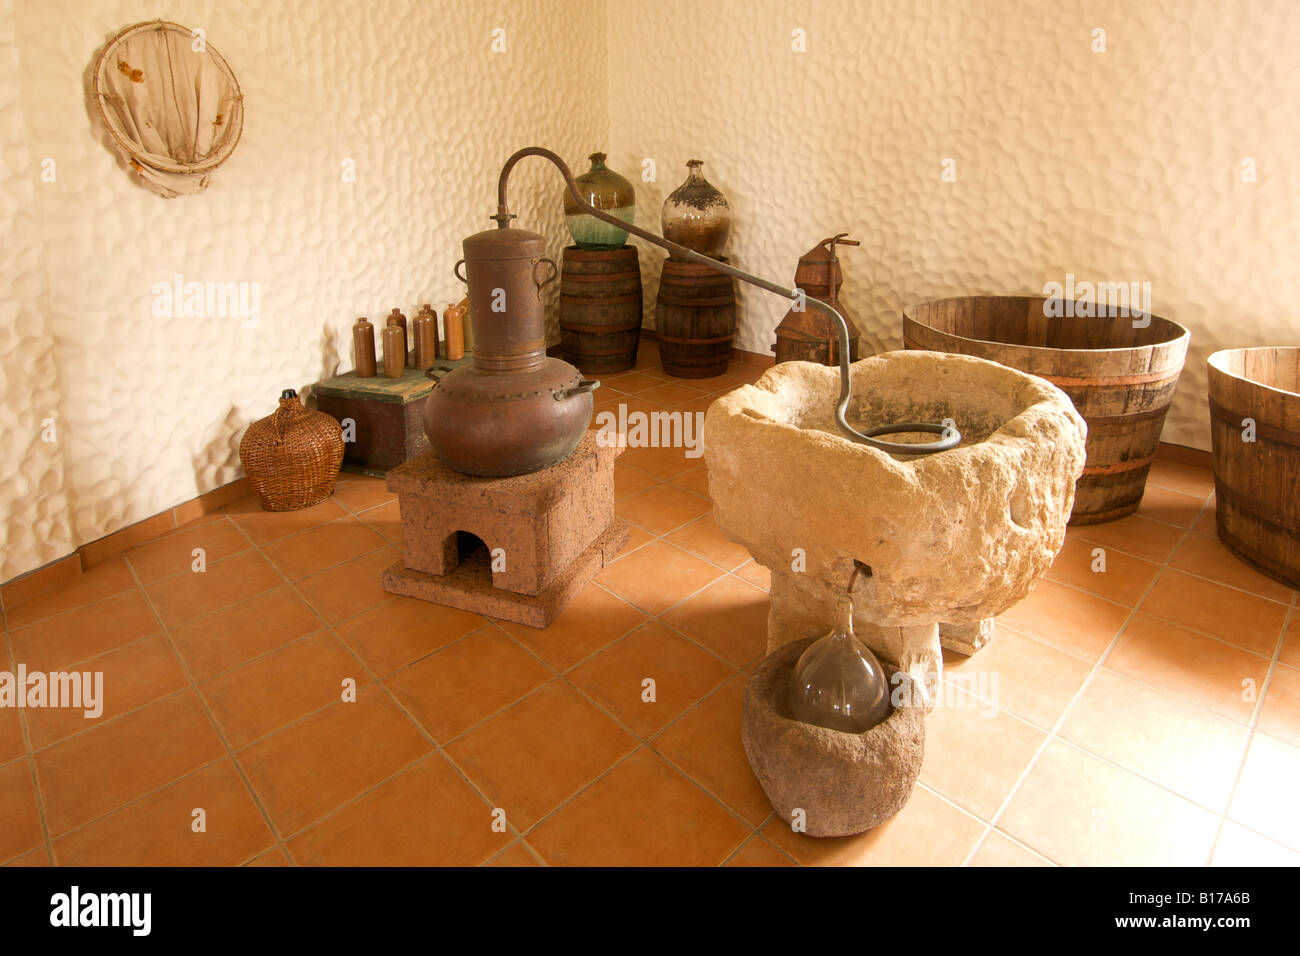 Distilling equipment in the Museu do Cardina museum on the Portuguese Atlantic island of Porto Santo. - Stock Image